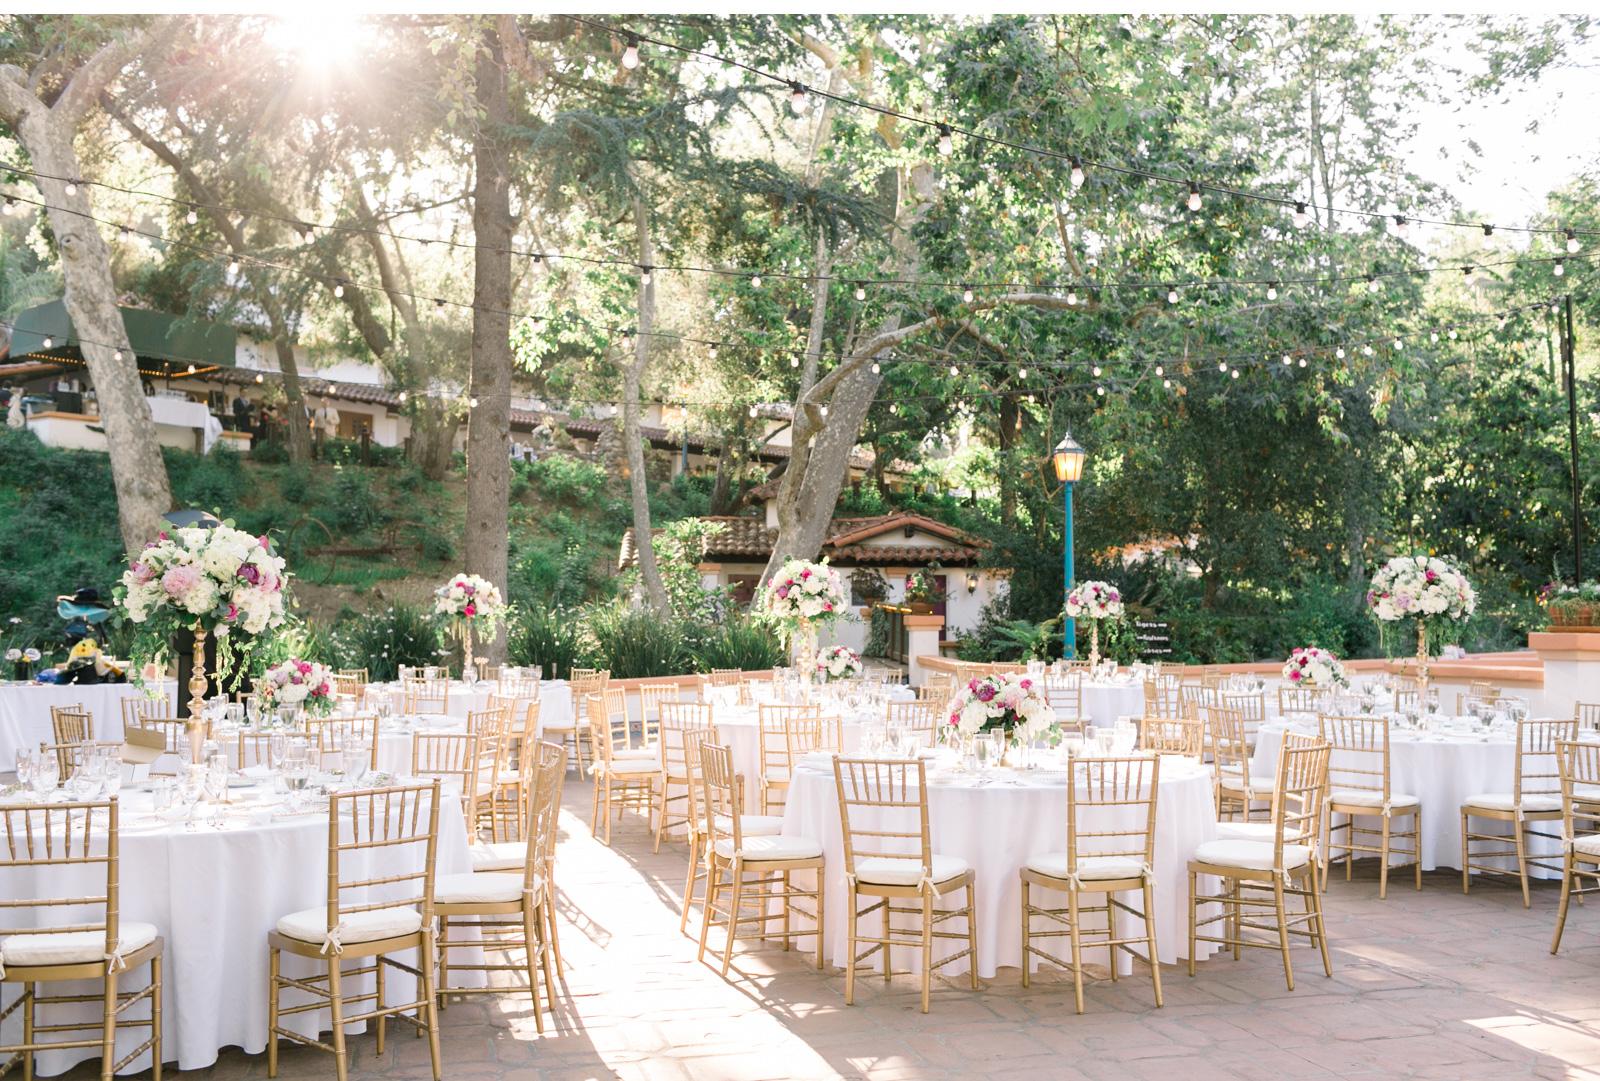 Rancho-Las-Lomas-Style-Me-Pretty-Wedding-Natalie-Schutt-Photography_13.jpg